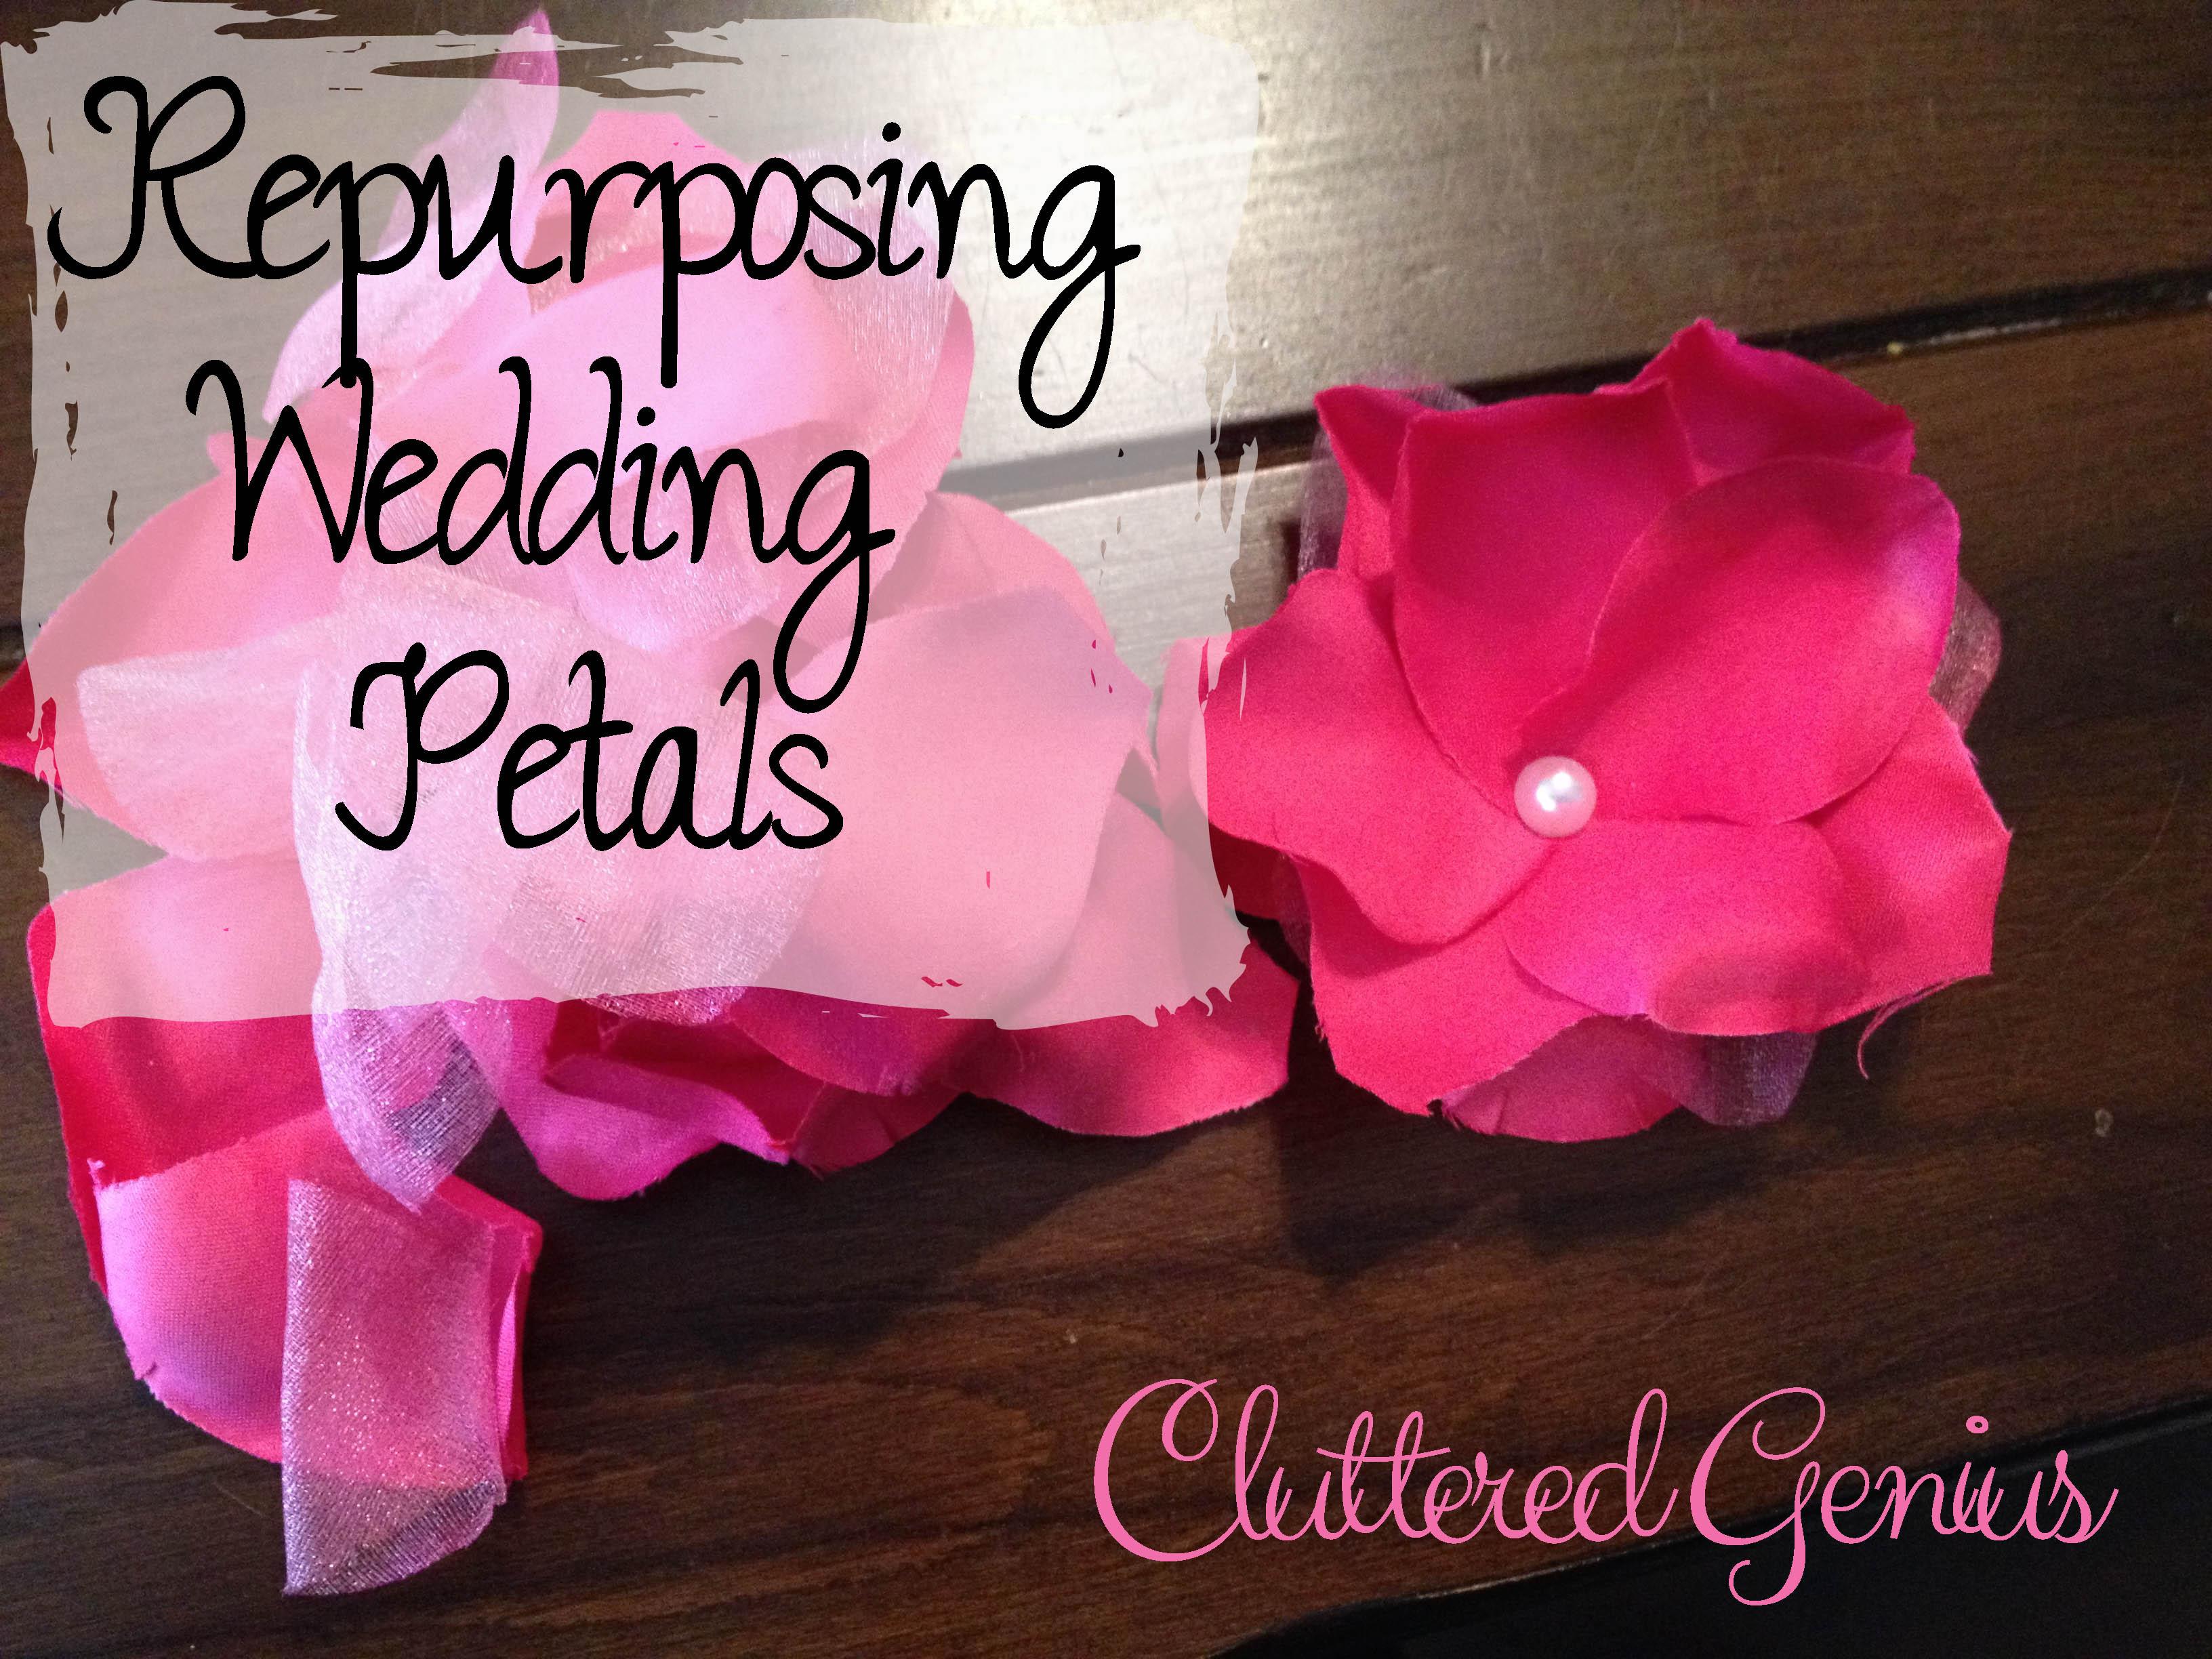 Repurposing Wedding Petals